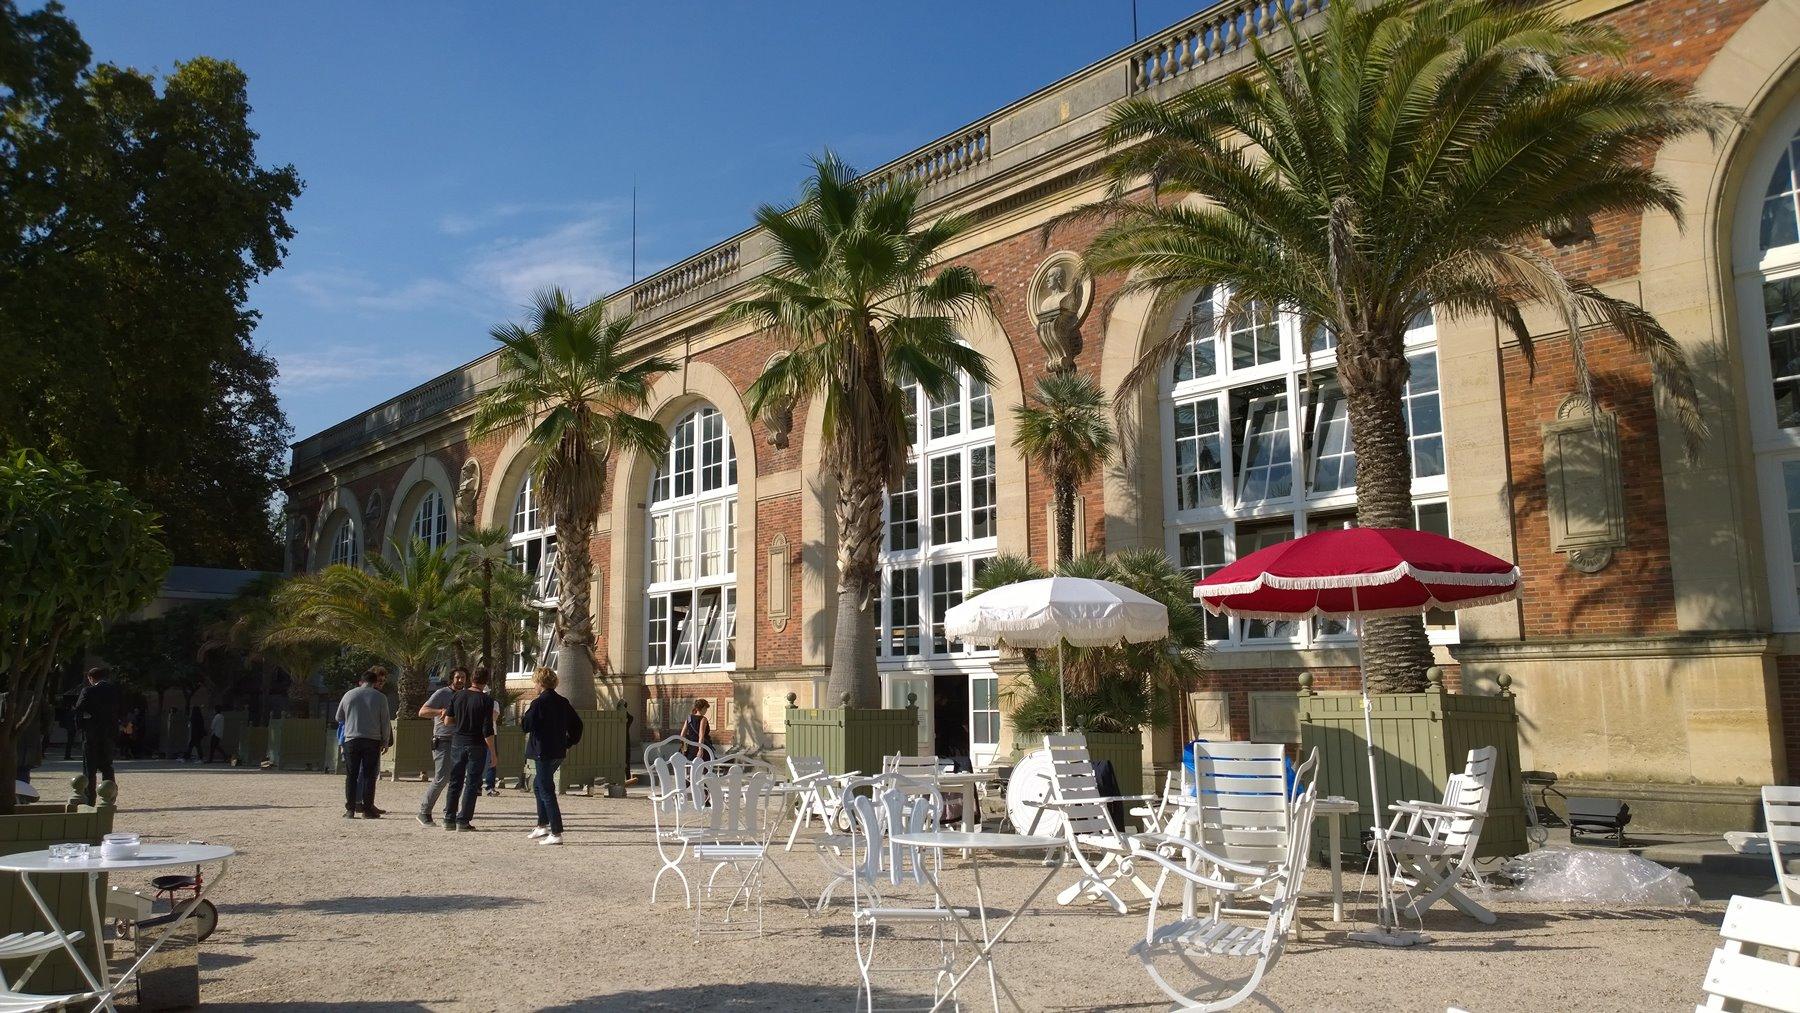 Para quien quiere grandes exposiciones: Musée du Luxembourg